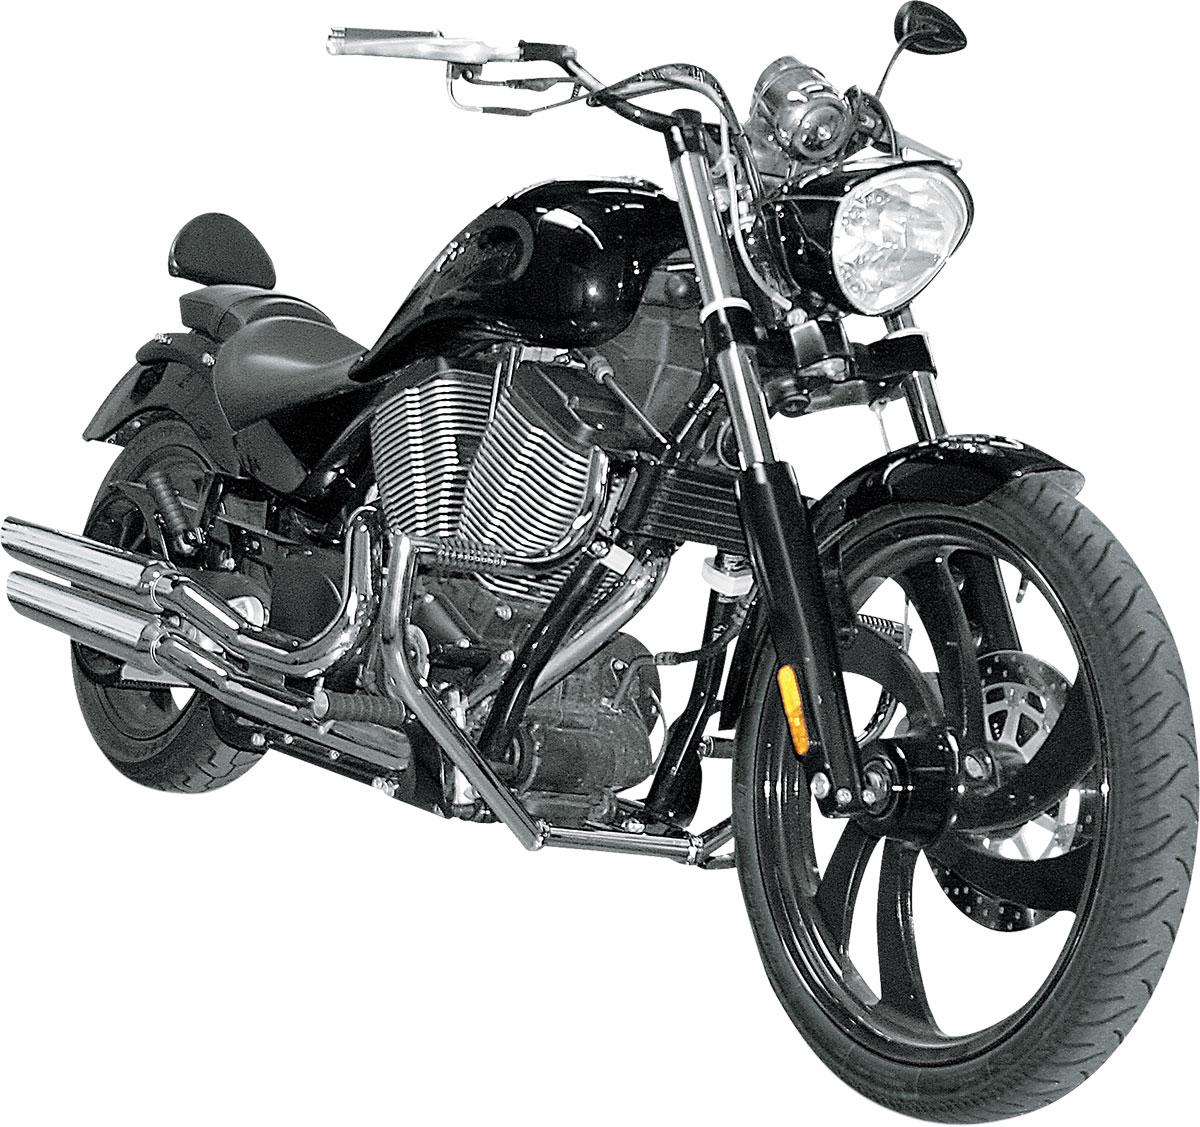 Chrome Honda VTX1300C VTX1300R VTX1300S VTX1300T Lindby UNIBAR Highway Bars